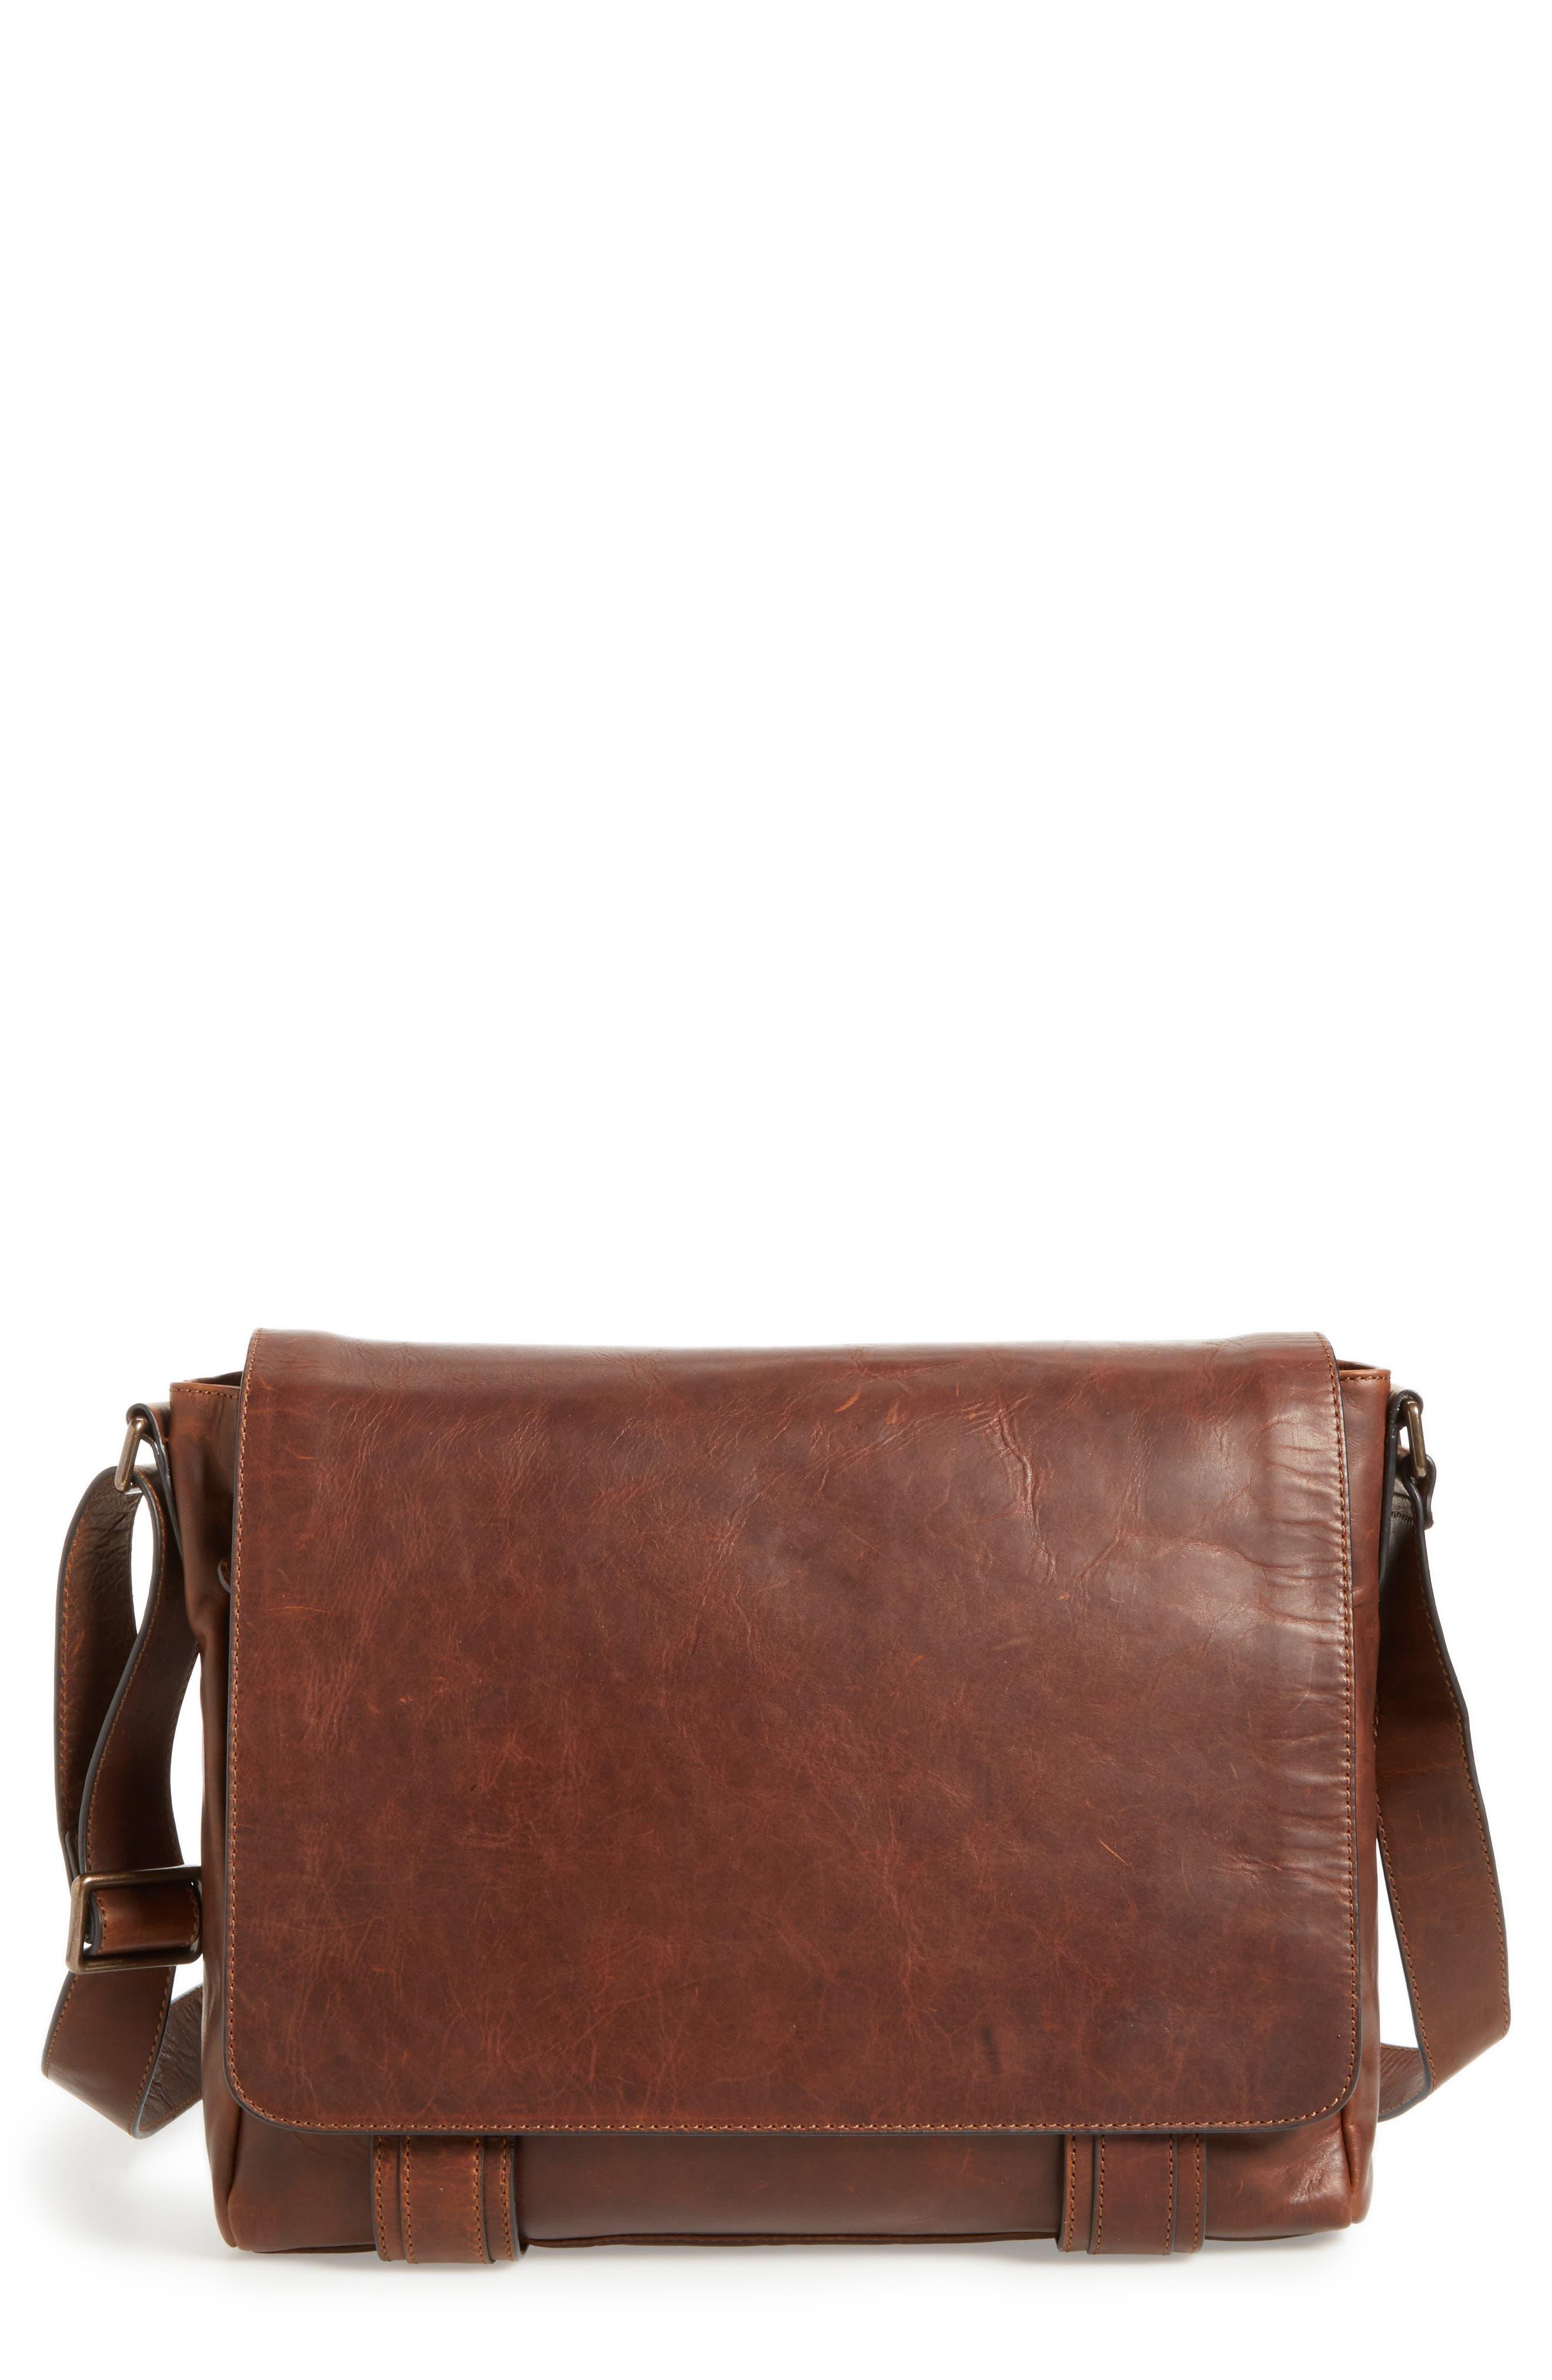 FRYE 'Logan' Messenger Bag, Main, color, ANTIQUE DARK BROWN